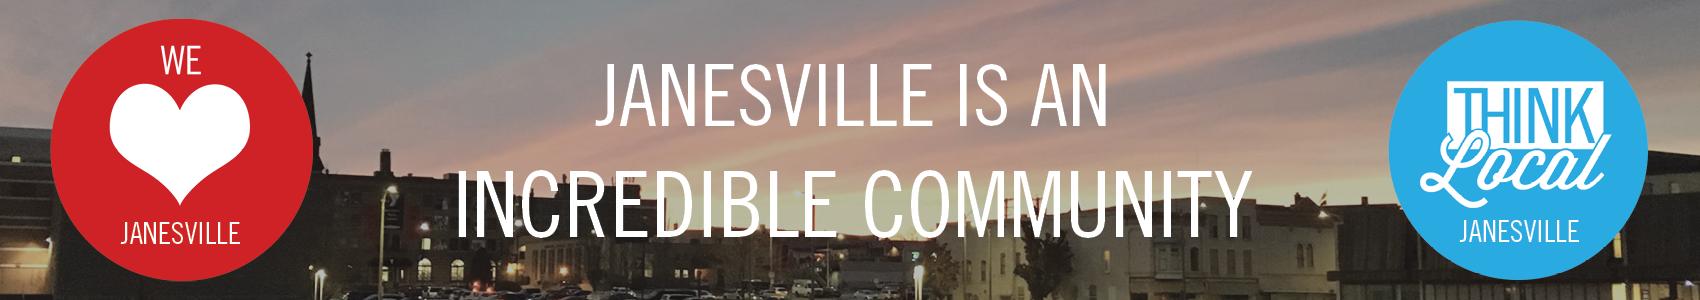 TLWebsite_JanesvilleHeader.png